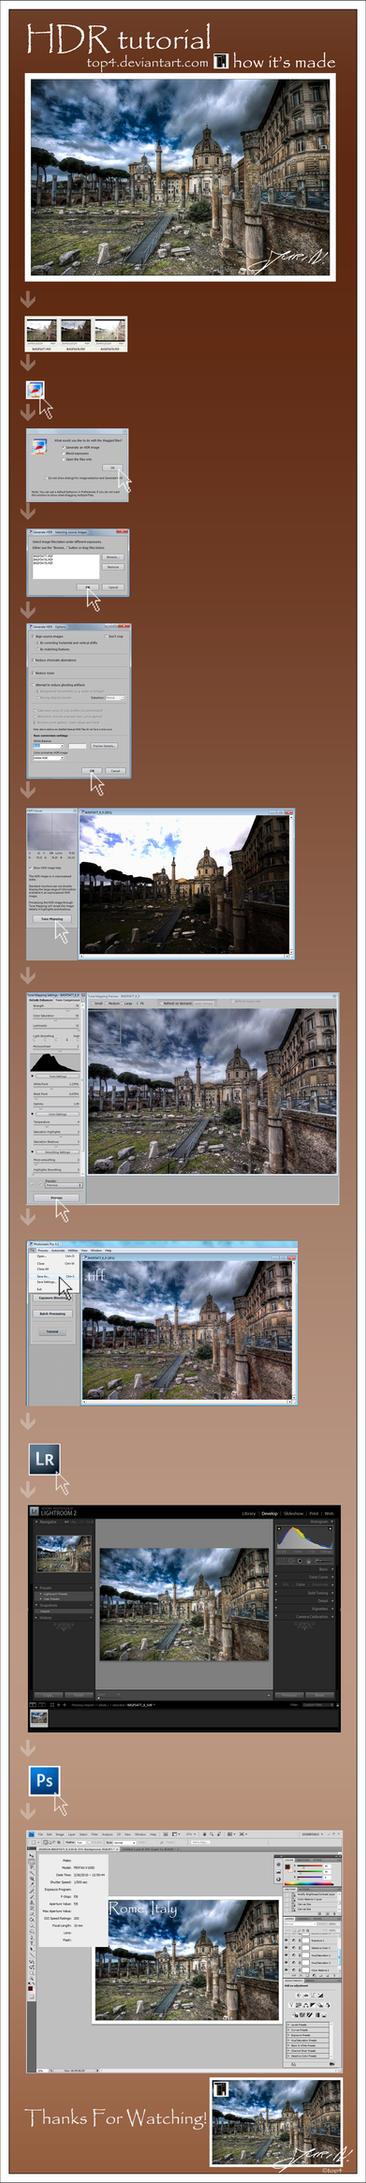 HDR tutorial by Jurnov